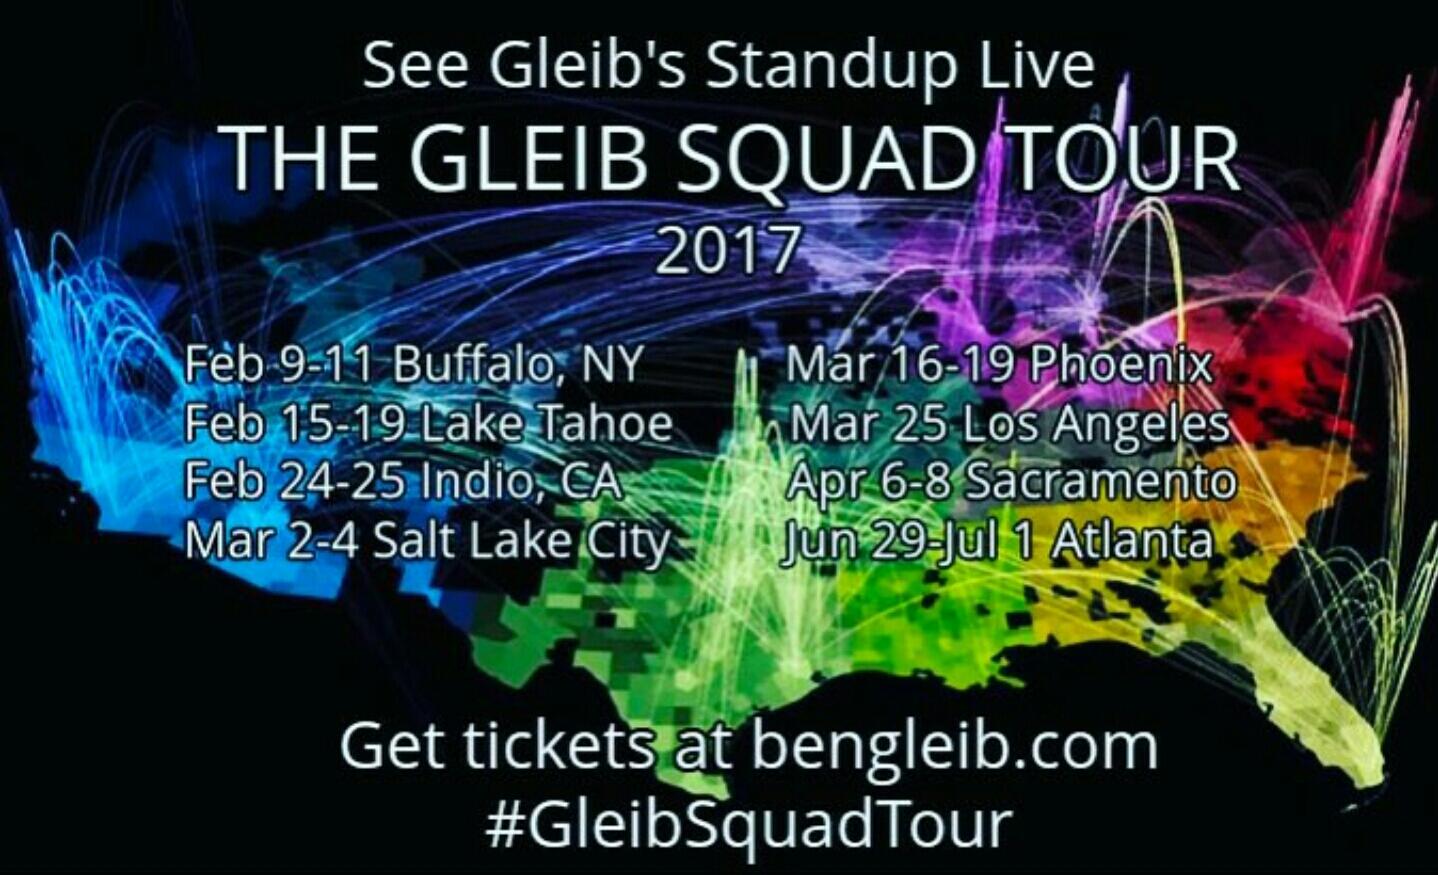 The Gleib Squad Tour 2017